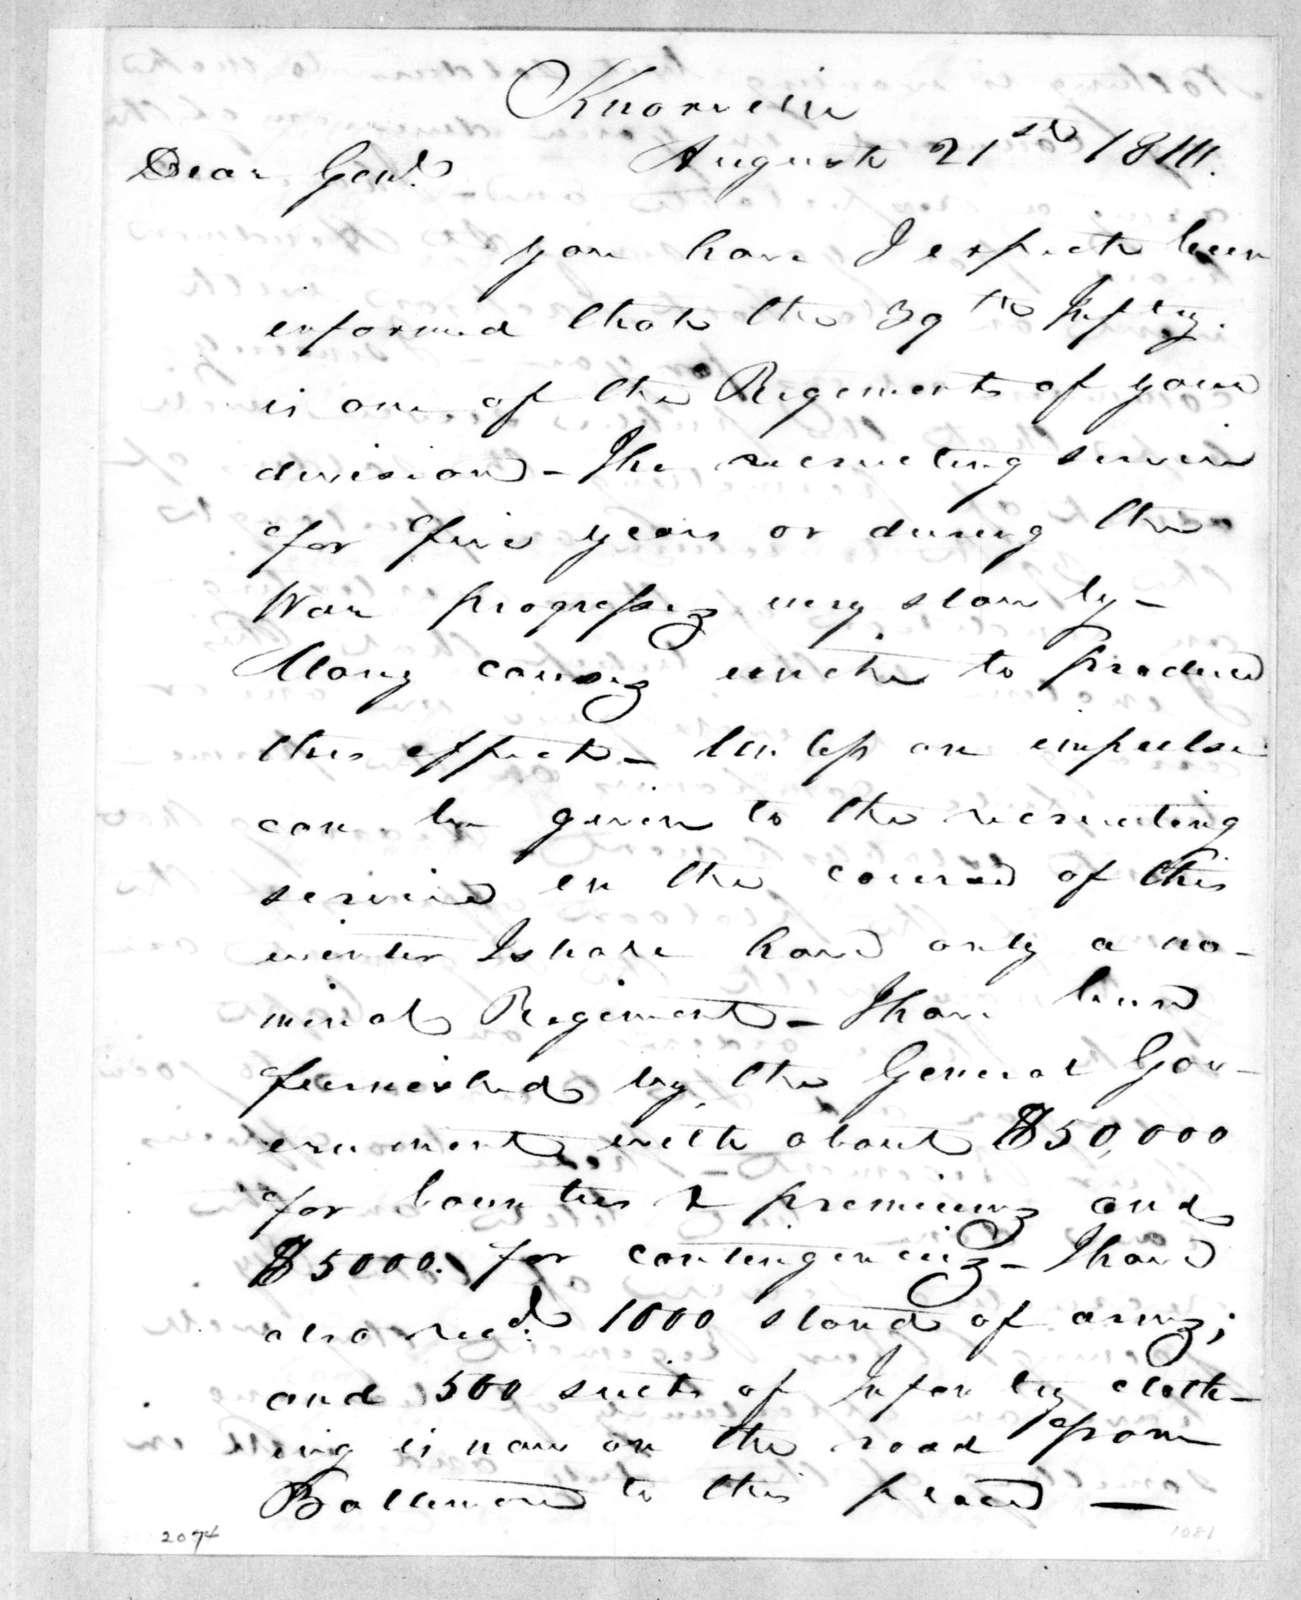 John Williams to Andrew Jackson, August 21, 1814